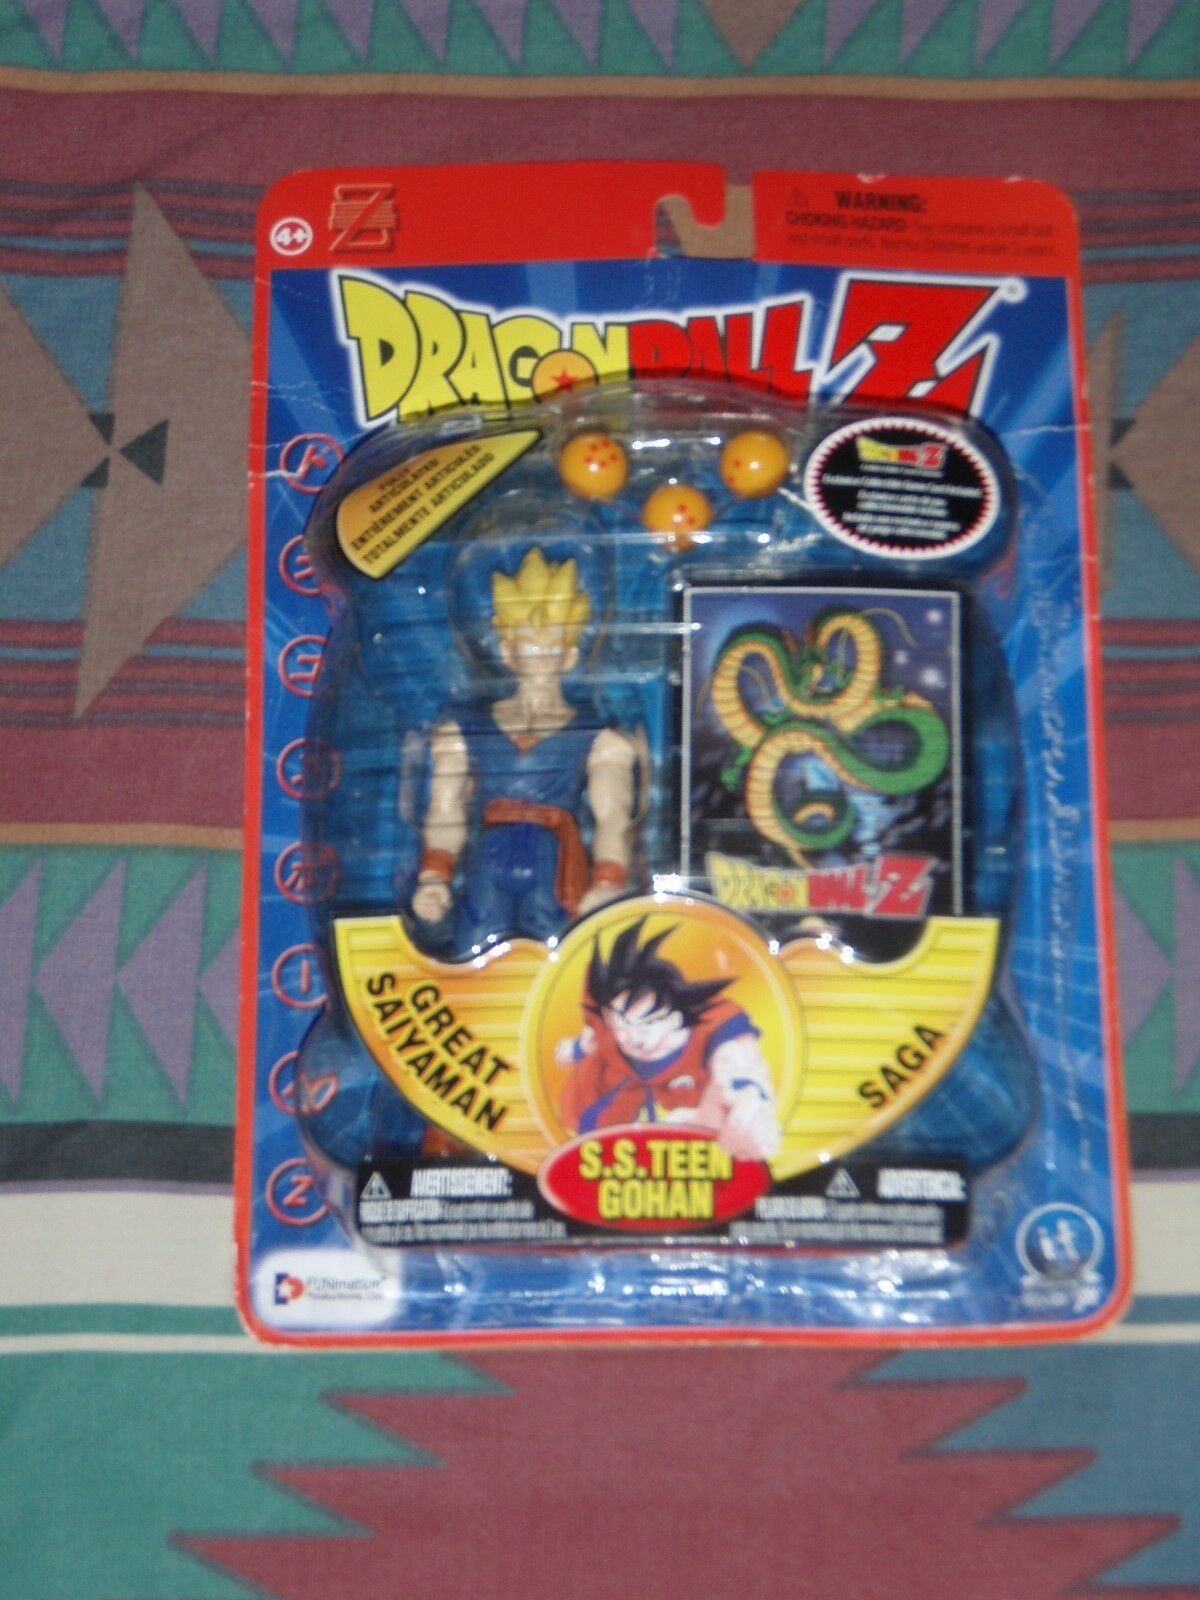 Irwin Dragon Ball Z Action Figure  SS Teen Gohan